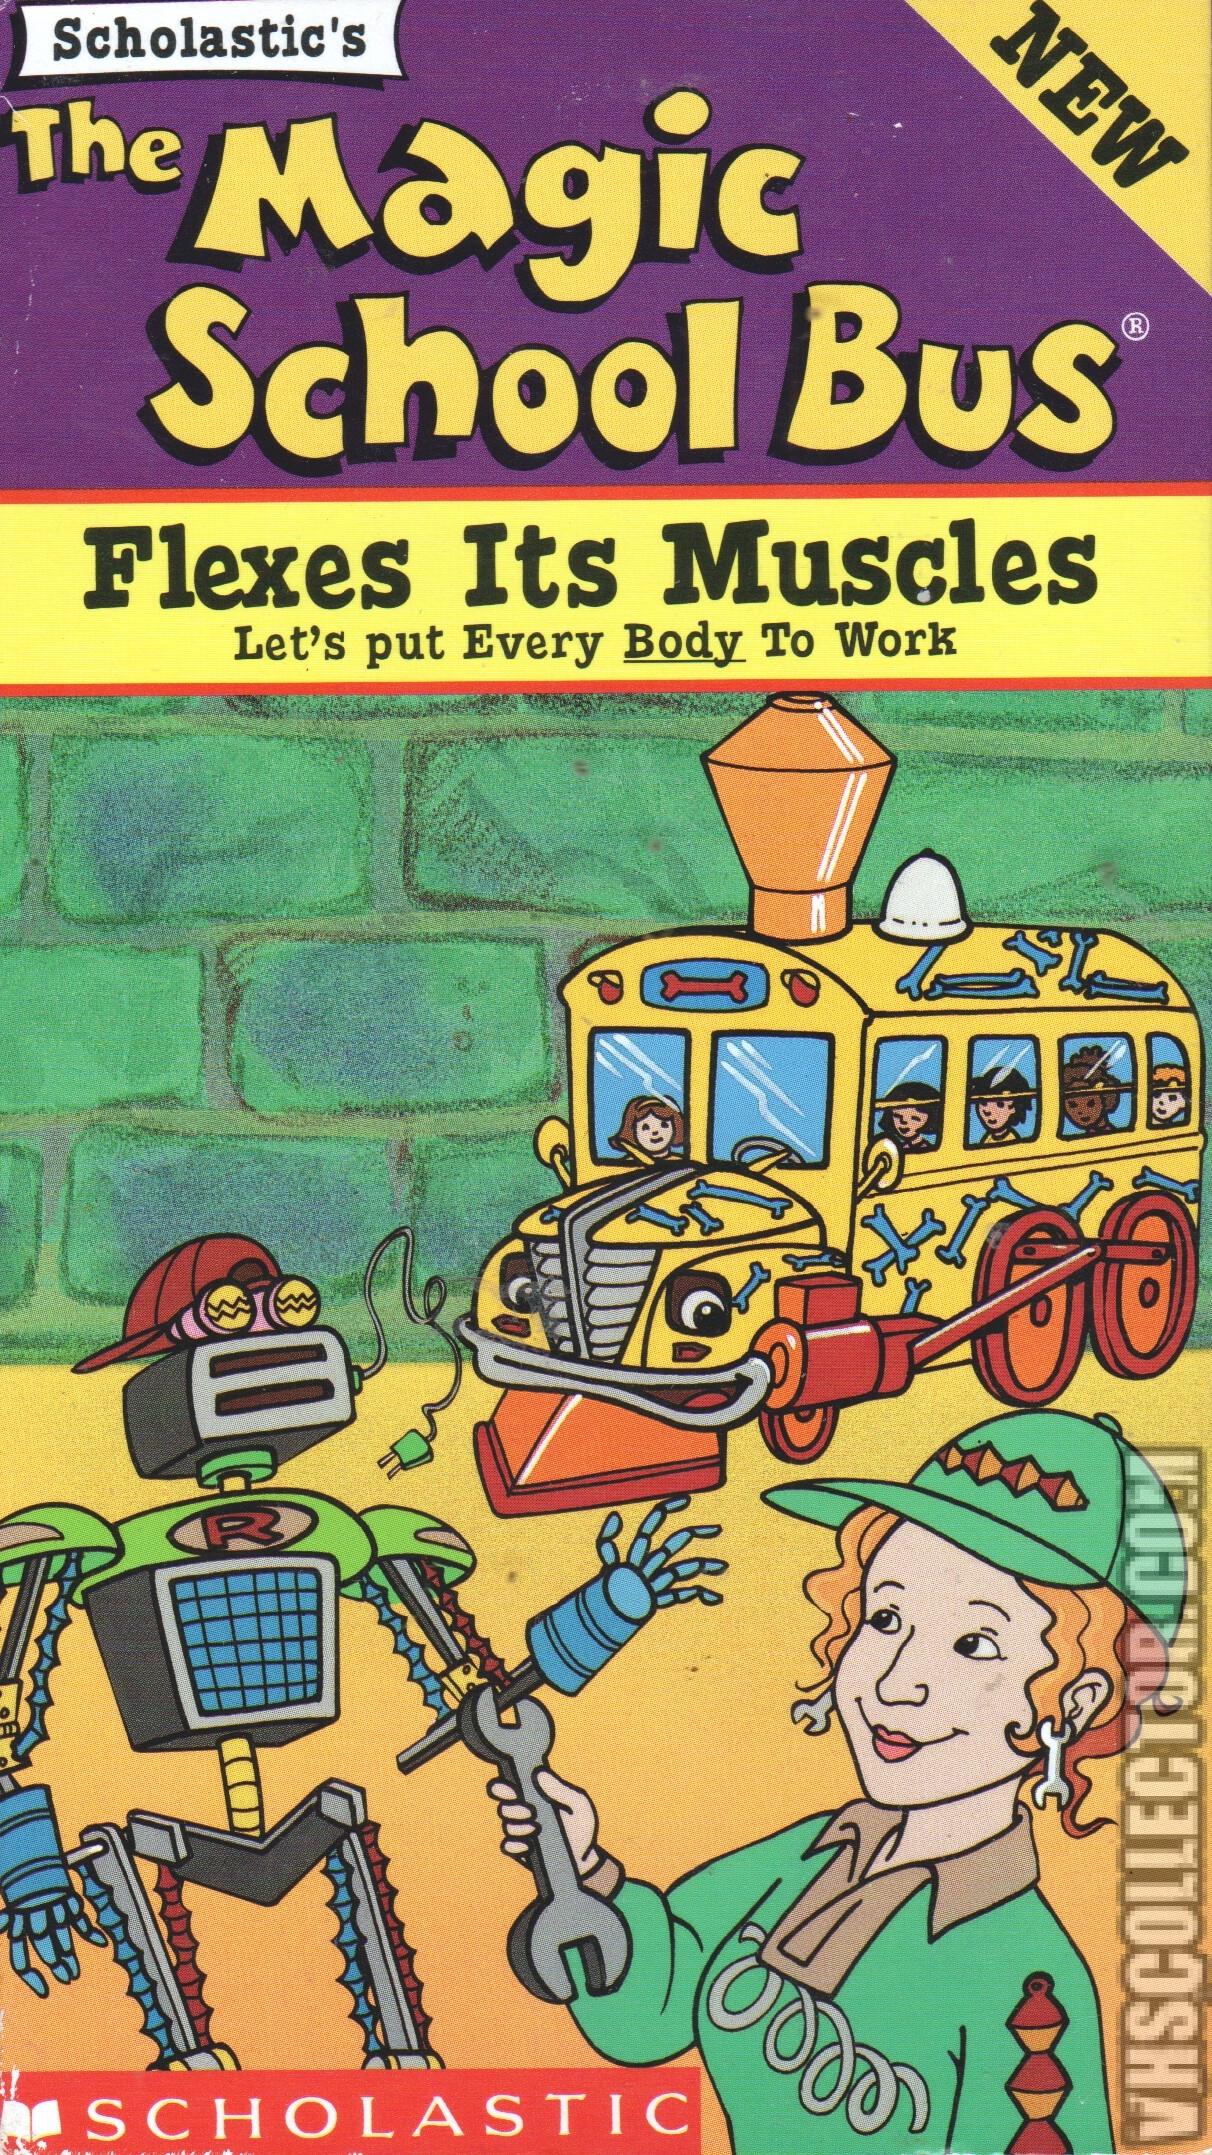 The Magic School Bus Flexes Its Muscles